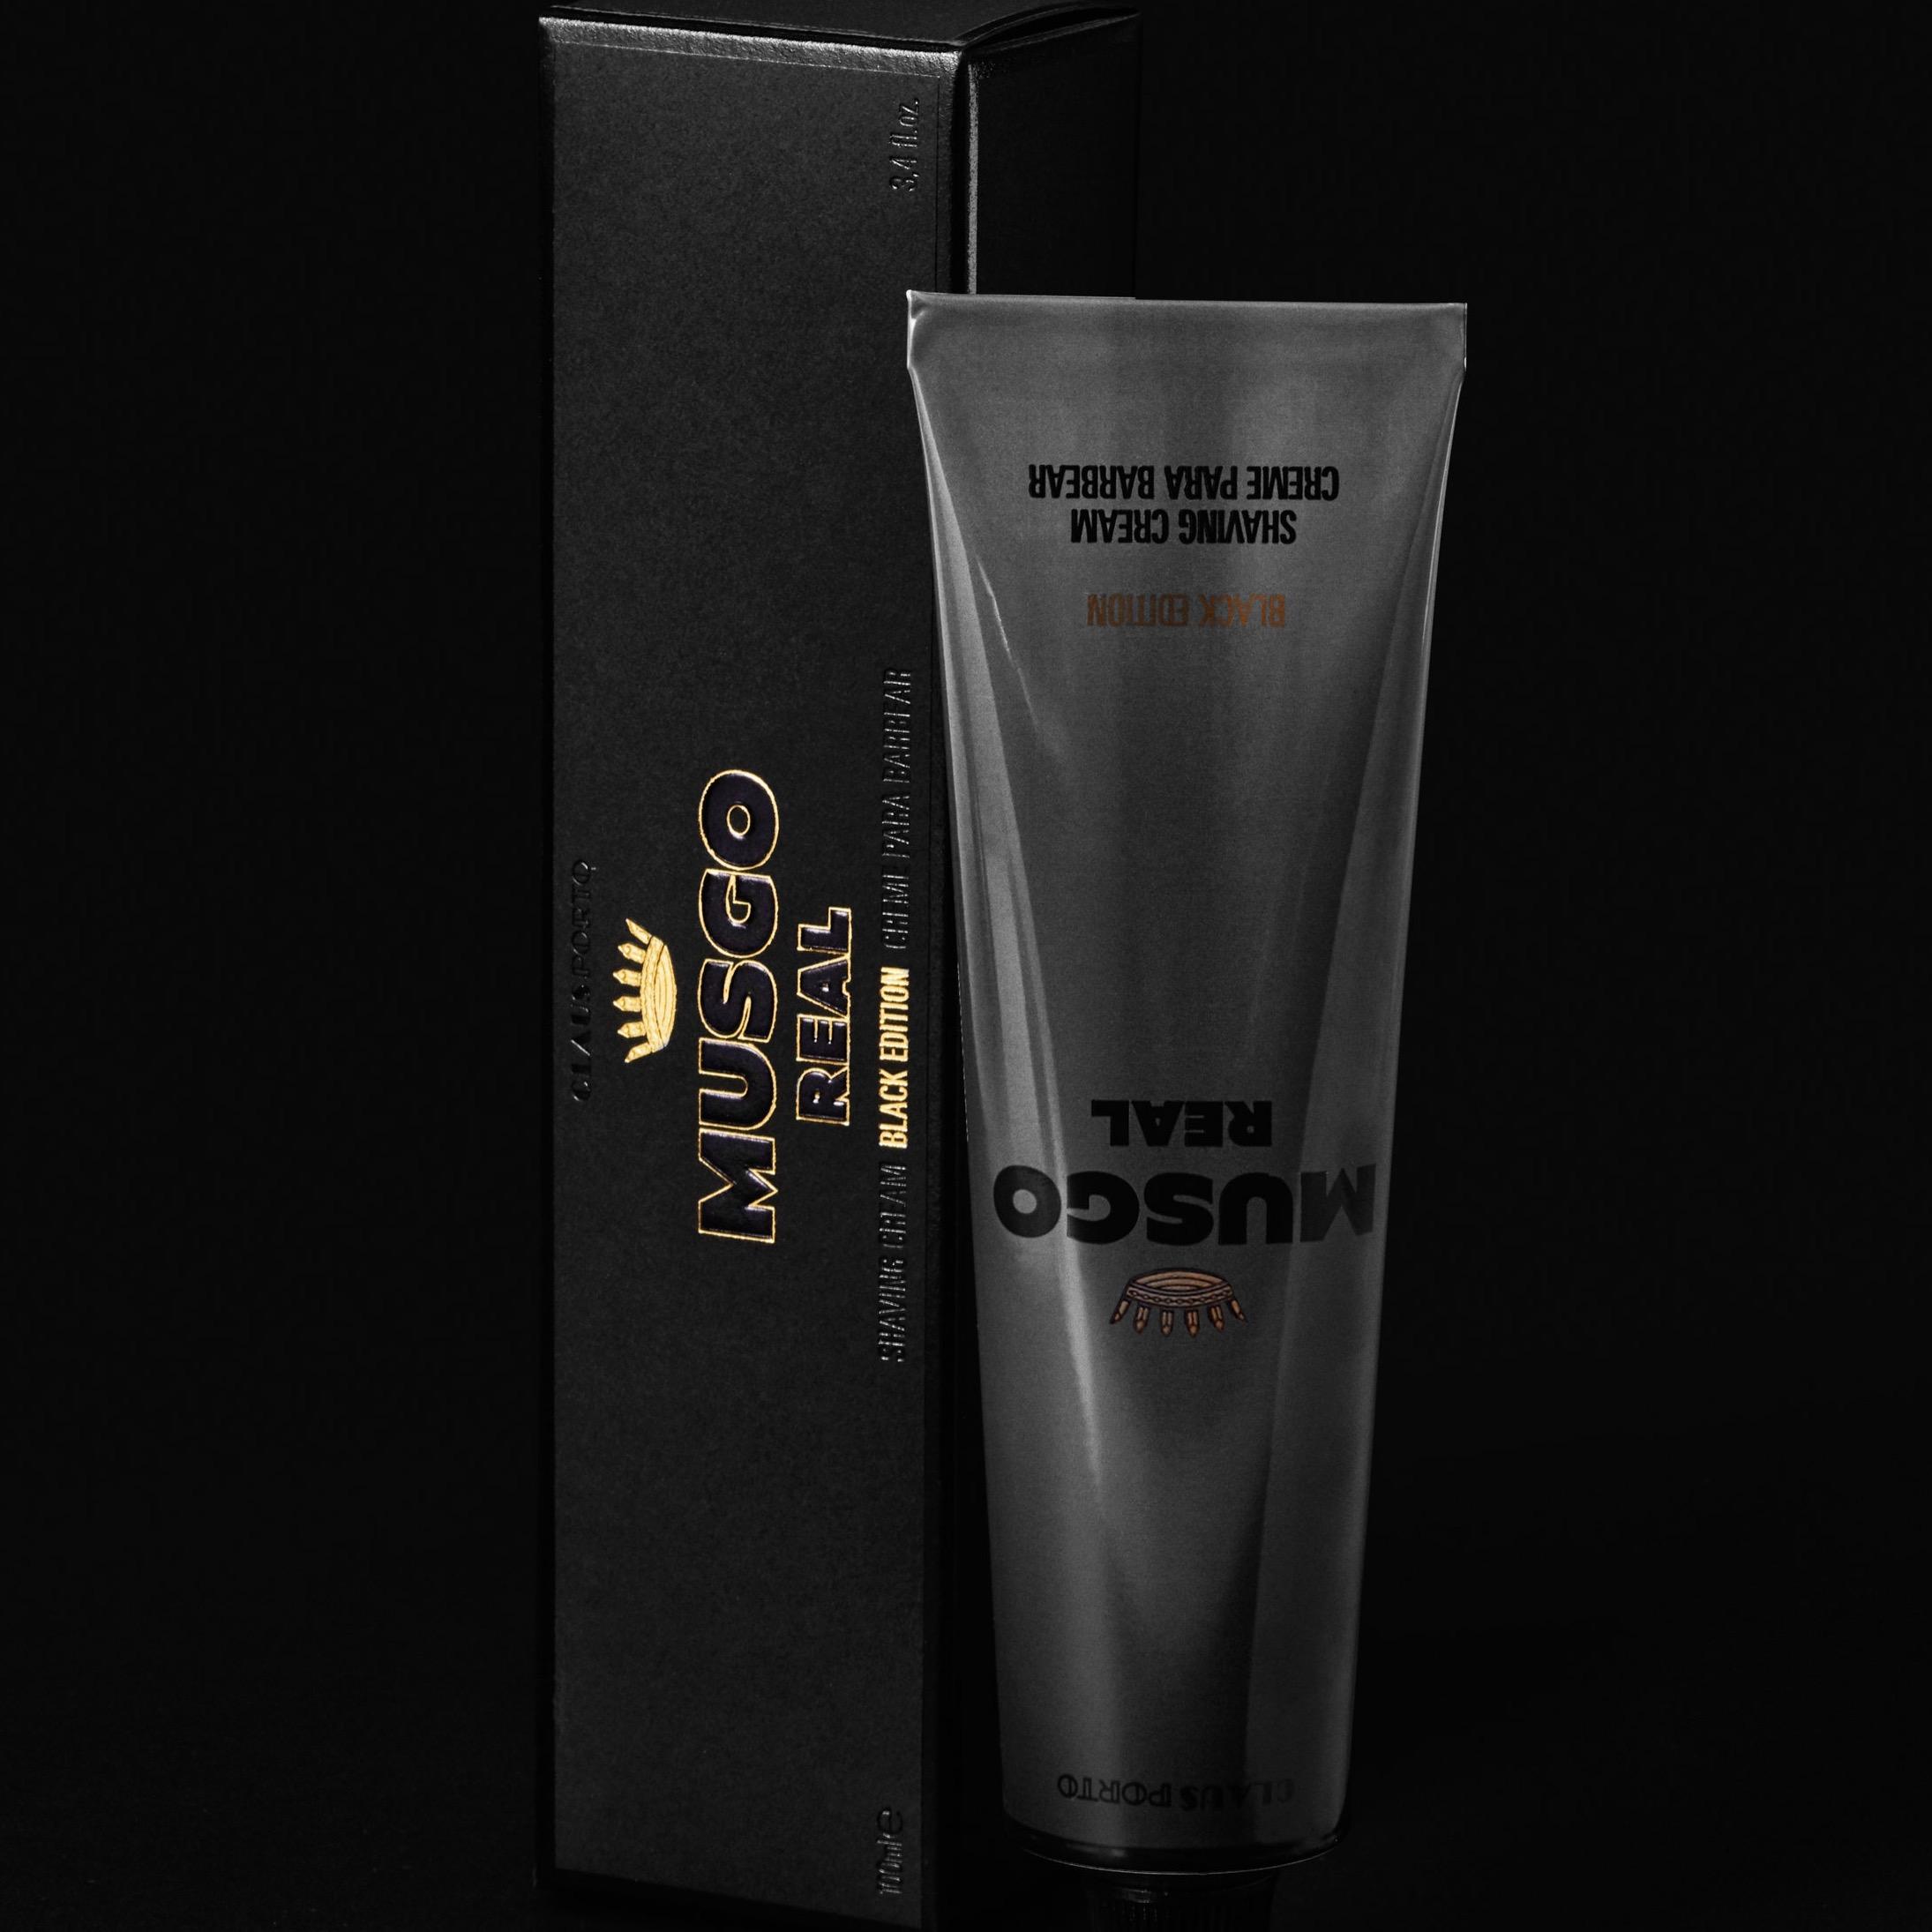 Scheercrème tube Black Edition